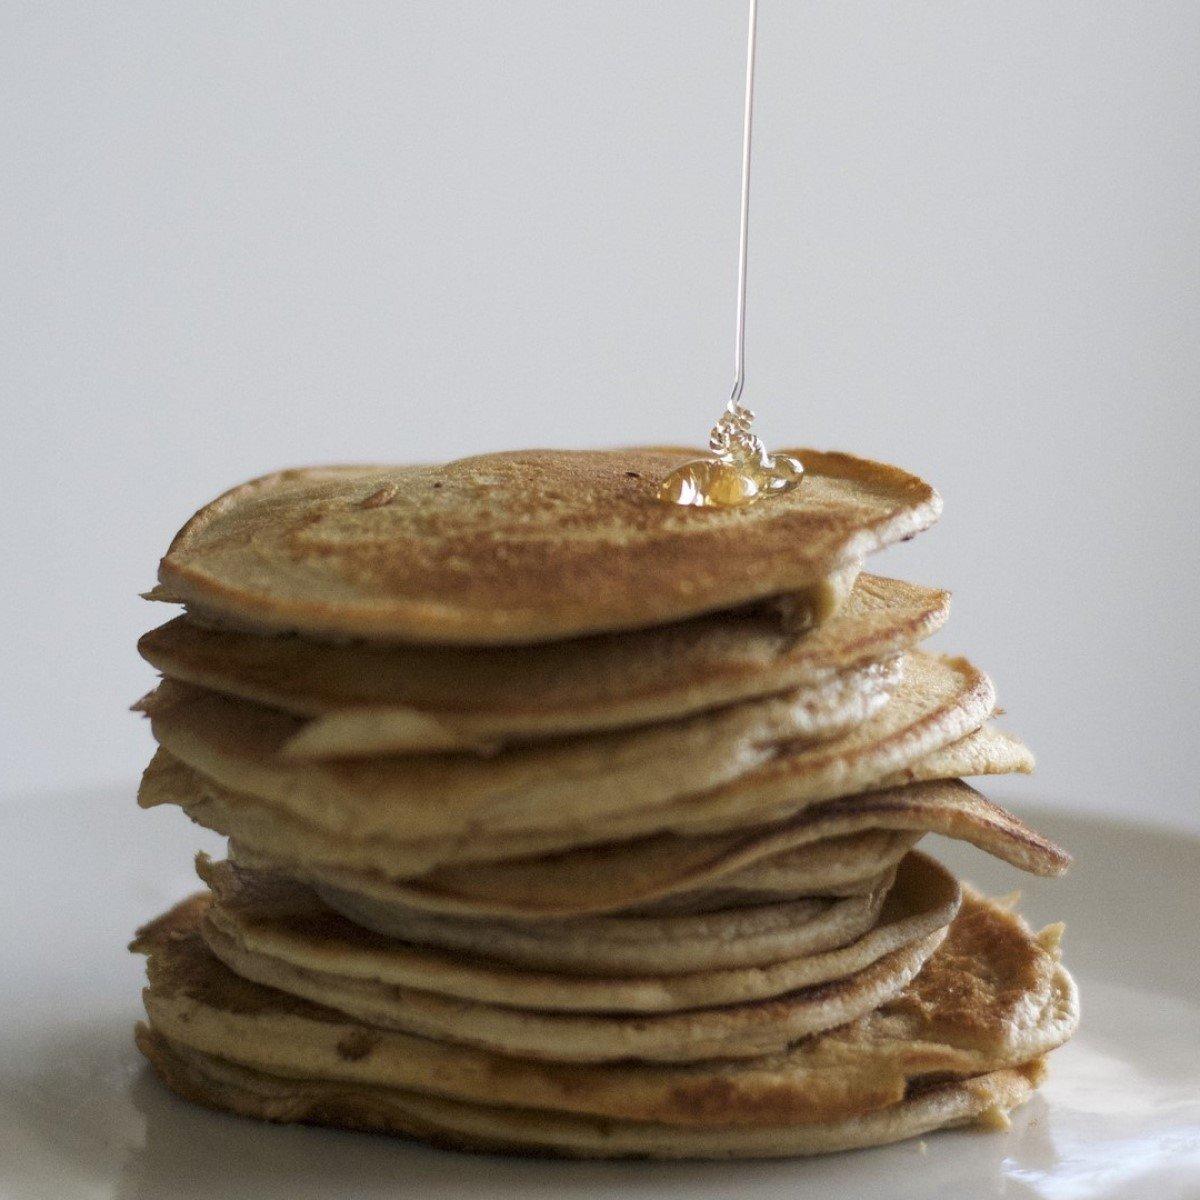 Healthy Oat Pancakes Recipe